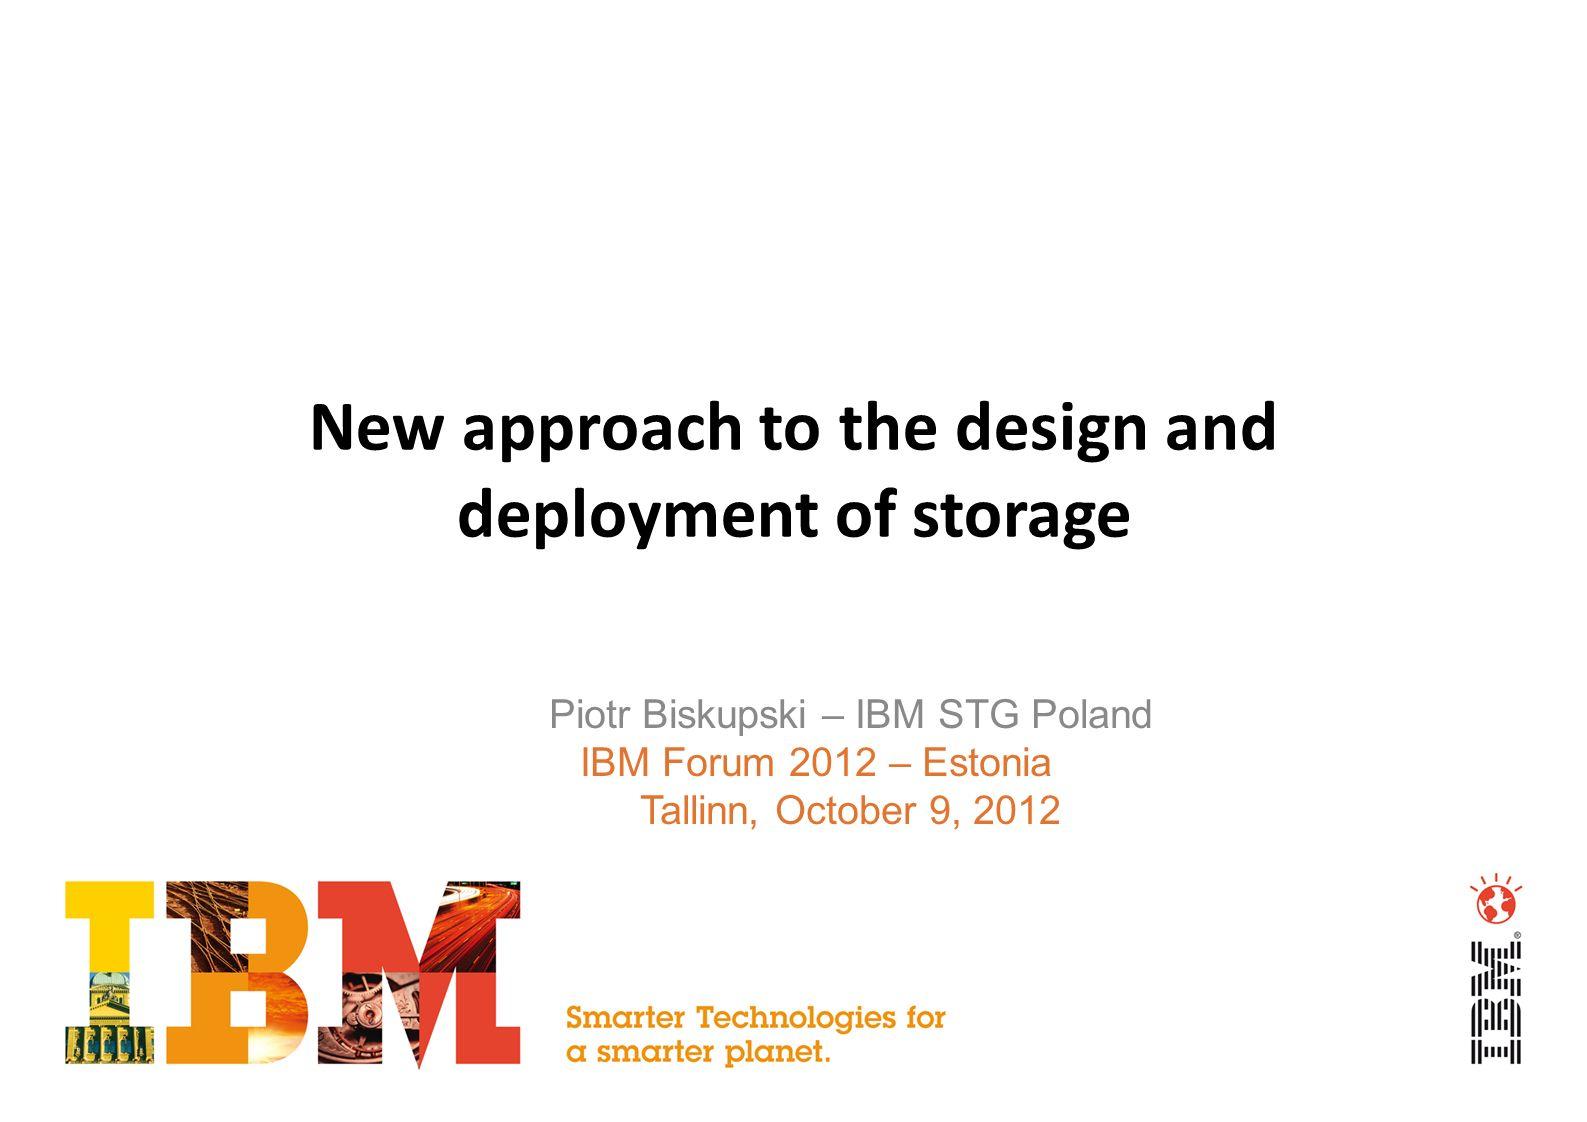 New approach to the design and deployment of storage Piotr Biskupski – IBM STG Poland IBM Forum 2012 – Estonia Tallinn, October 9, 2012